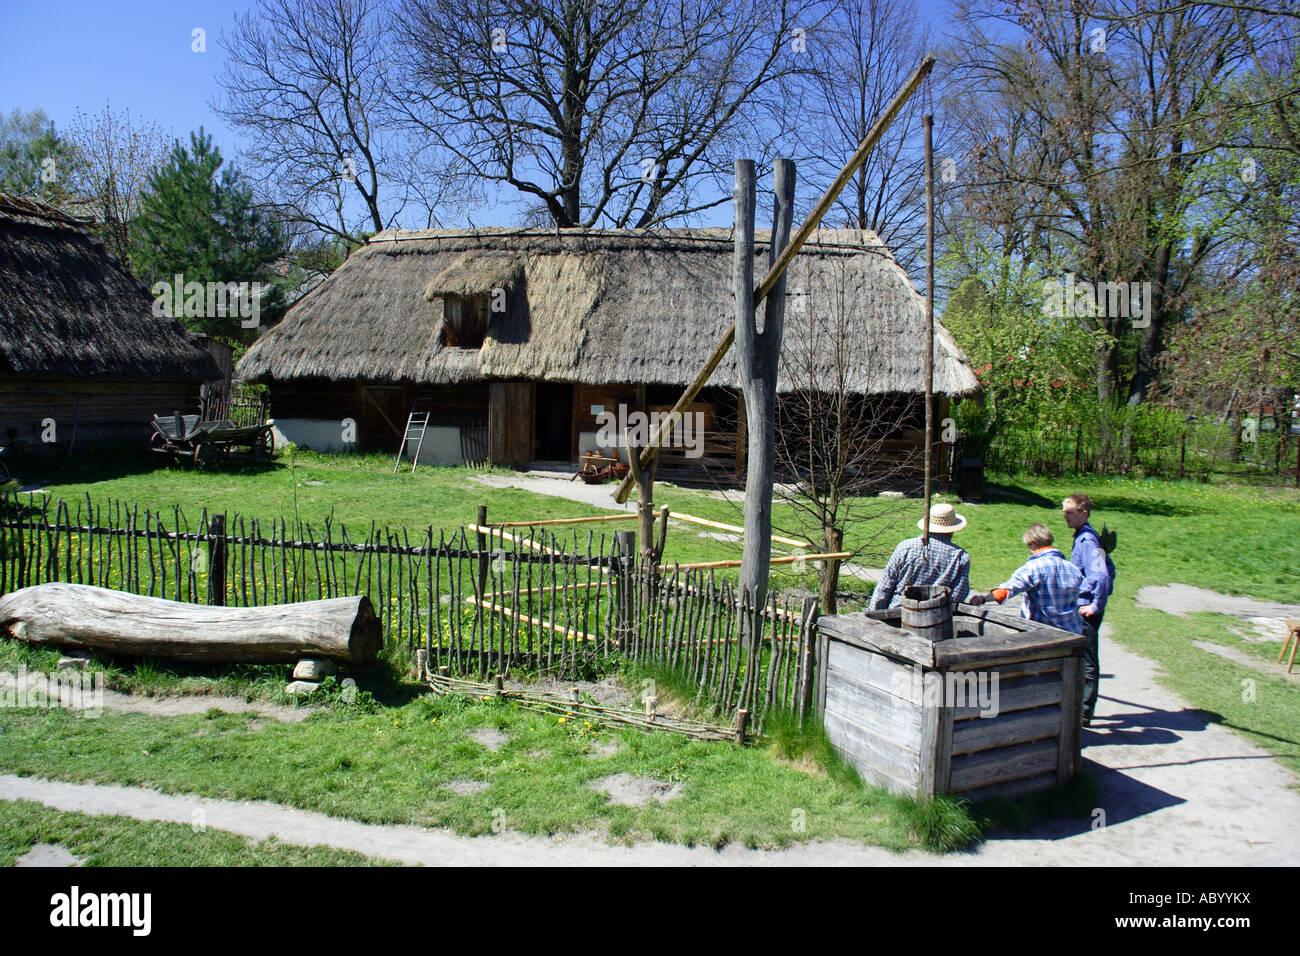 Crane well in Zagroda Guciow farm open air folk museum in Roztocze region Poland Stock Photo